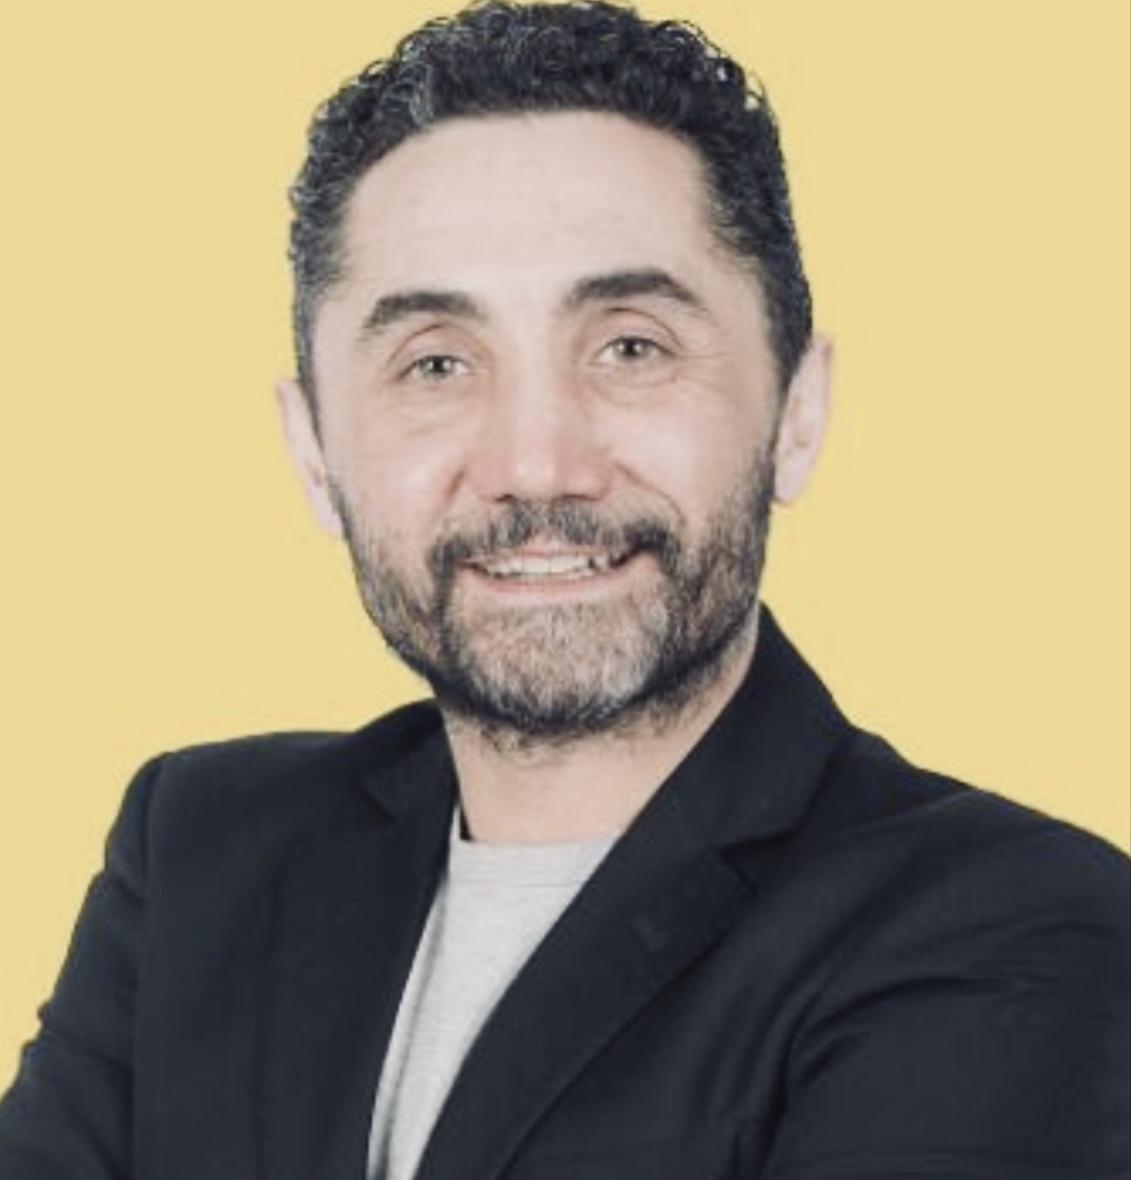 Nicola Acunzo Deputato M5S